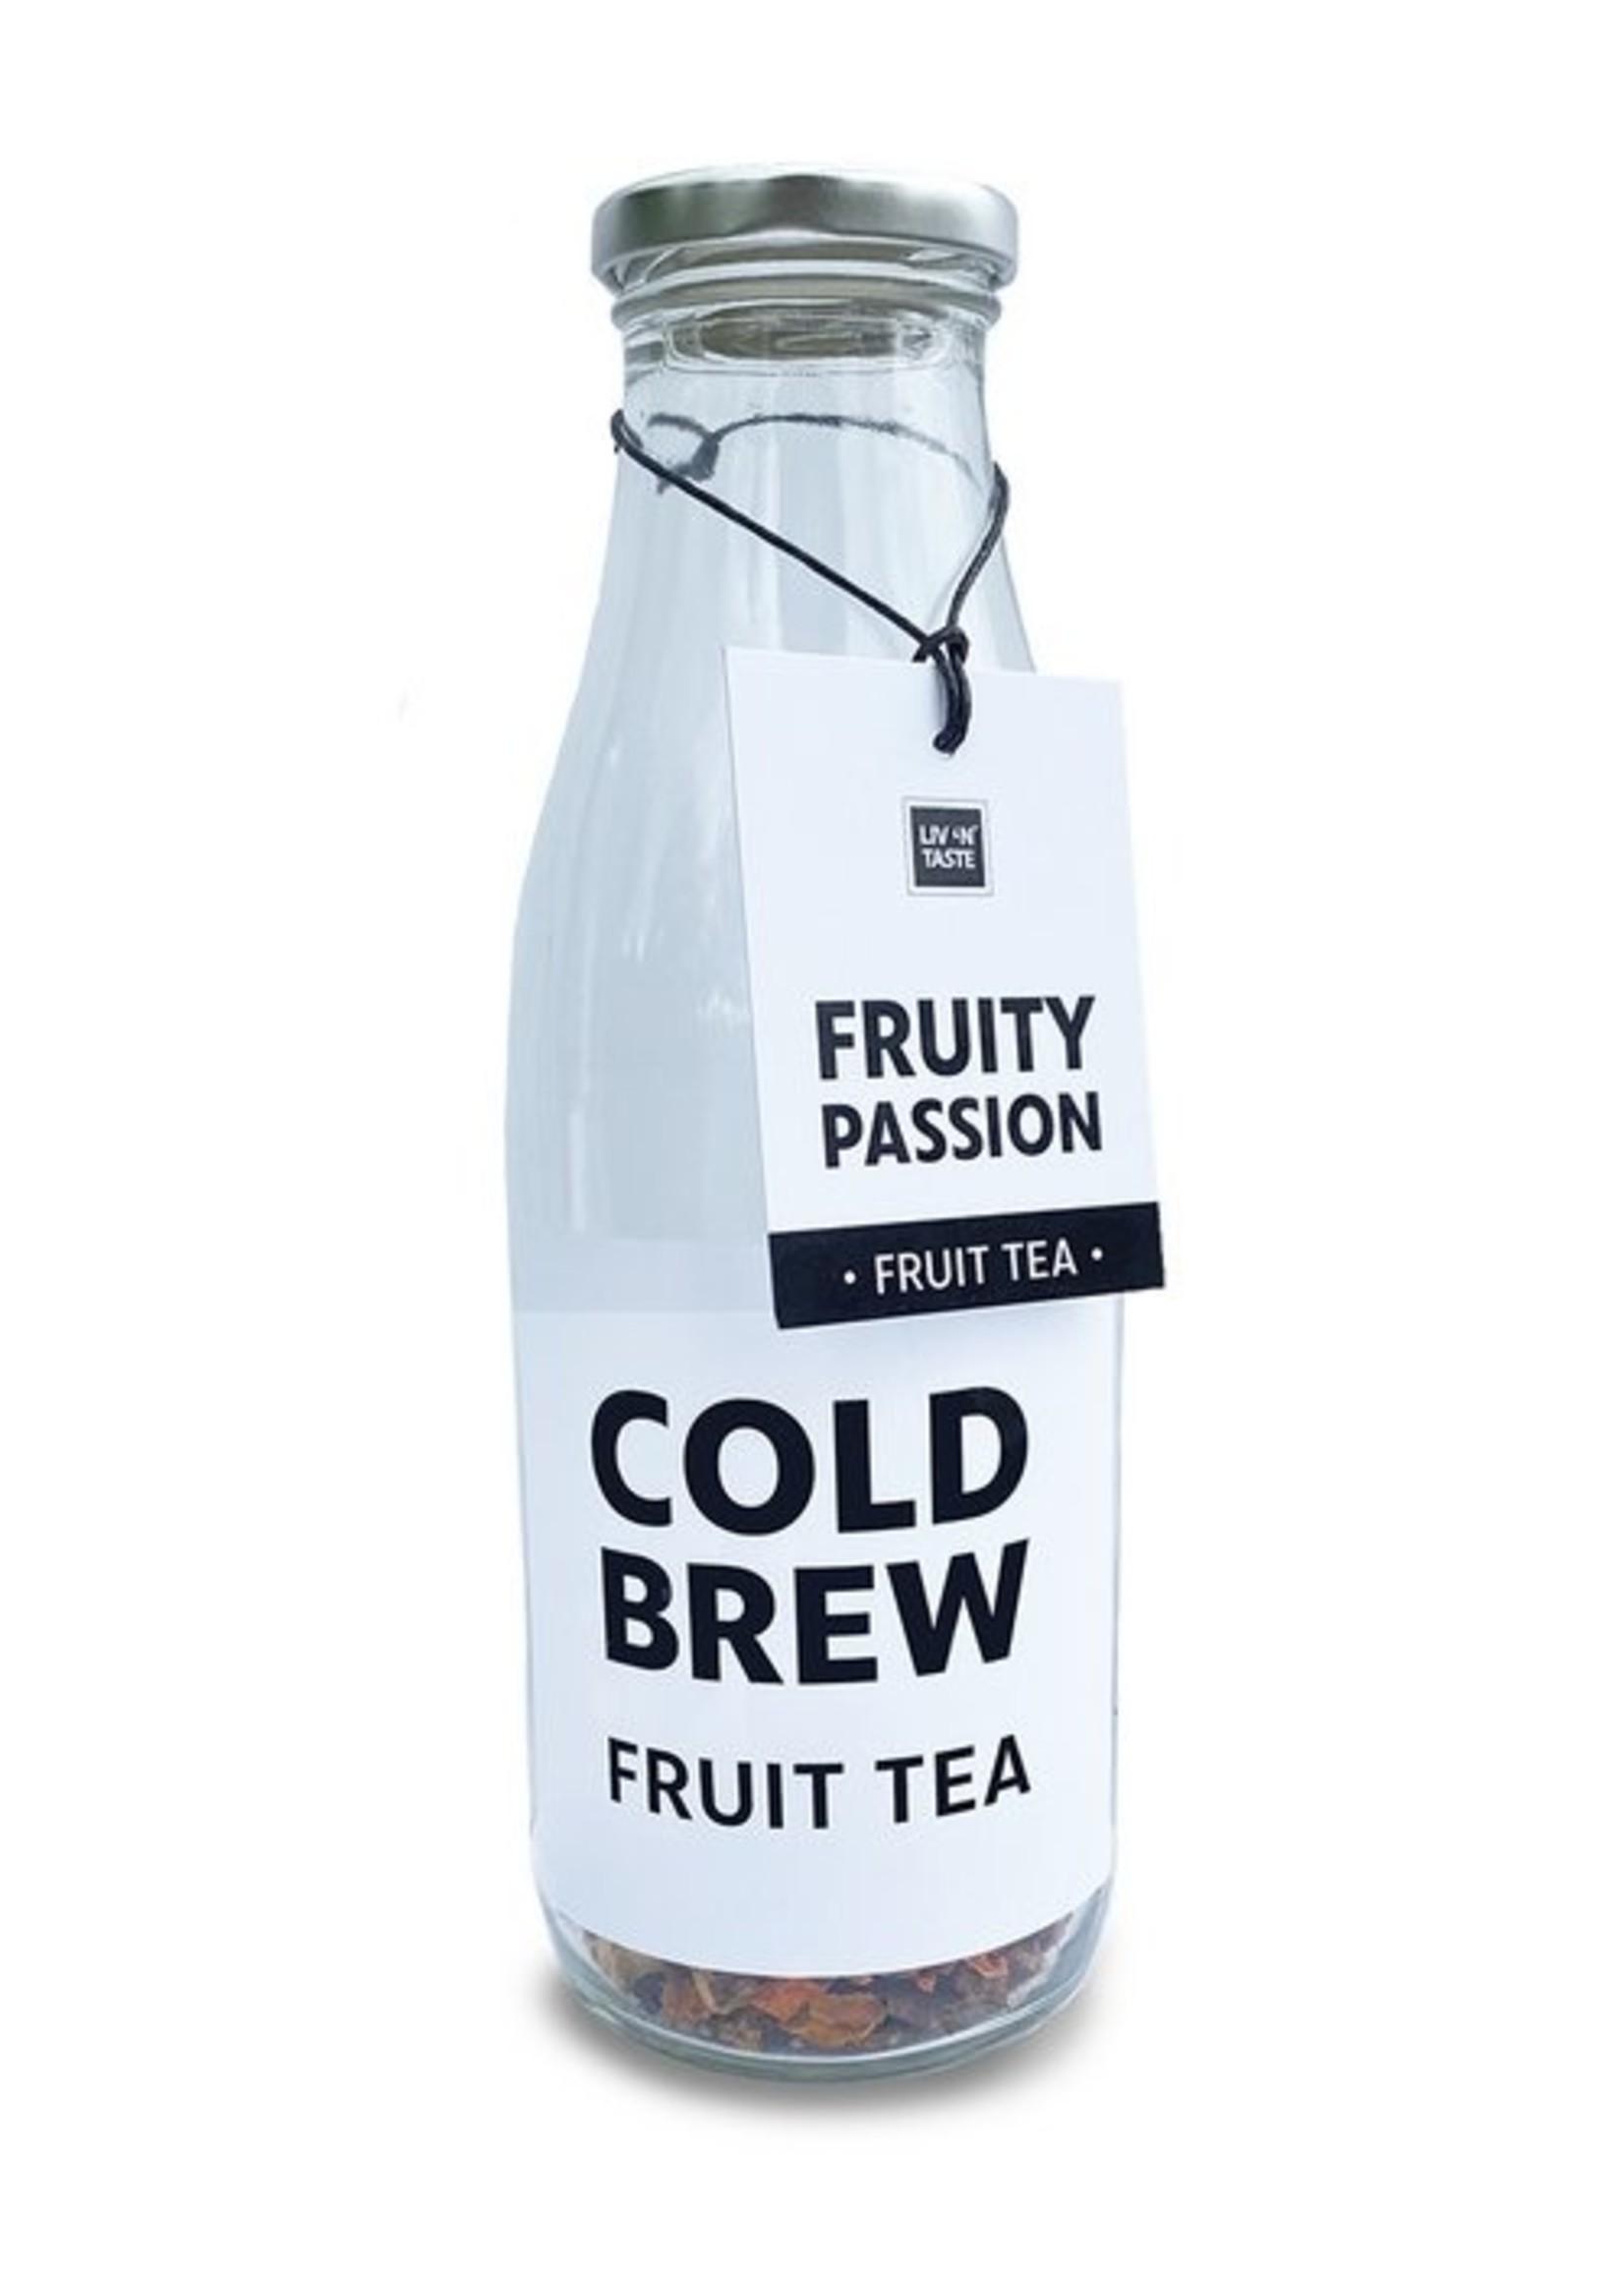 Liv 'n Taste Liv 'n Taste - Cold Brew Fruit Tea- Tasty Berry